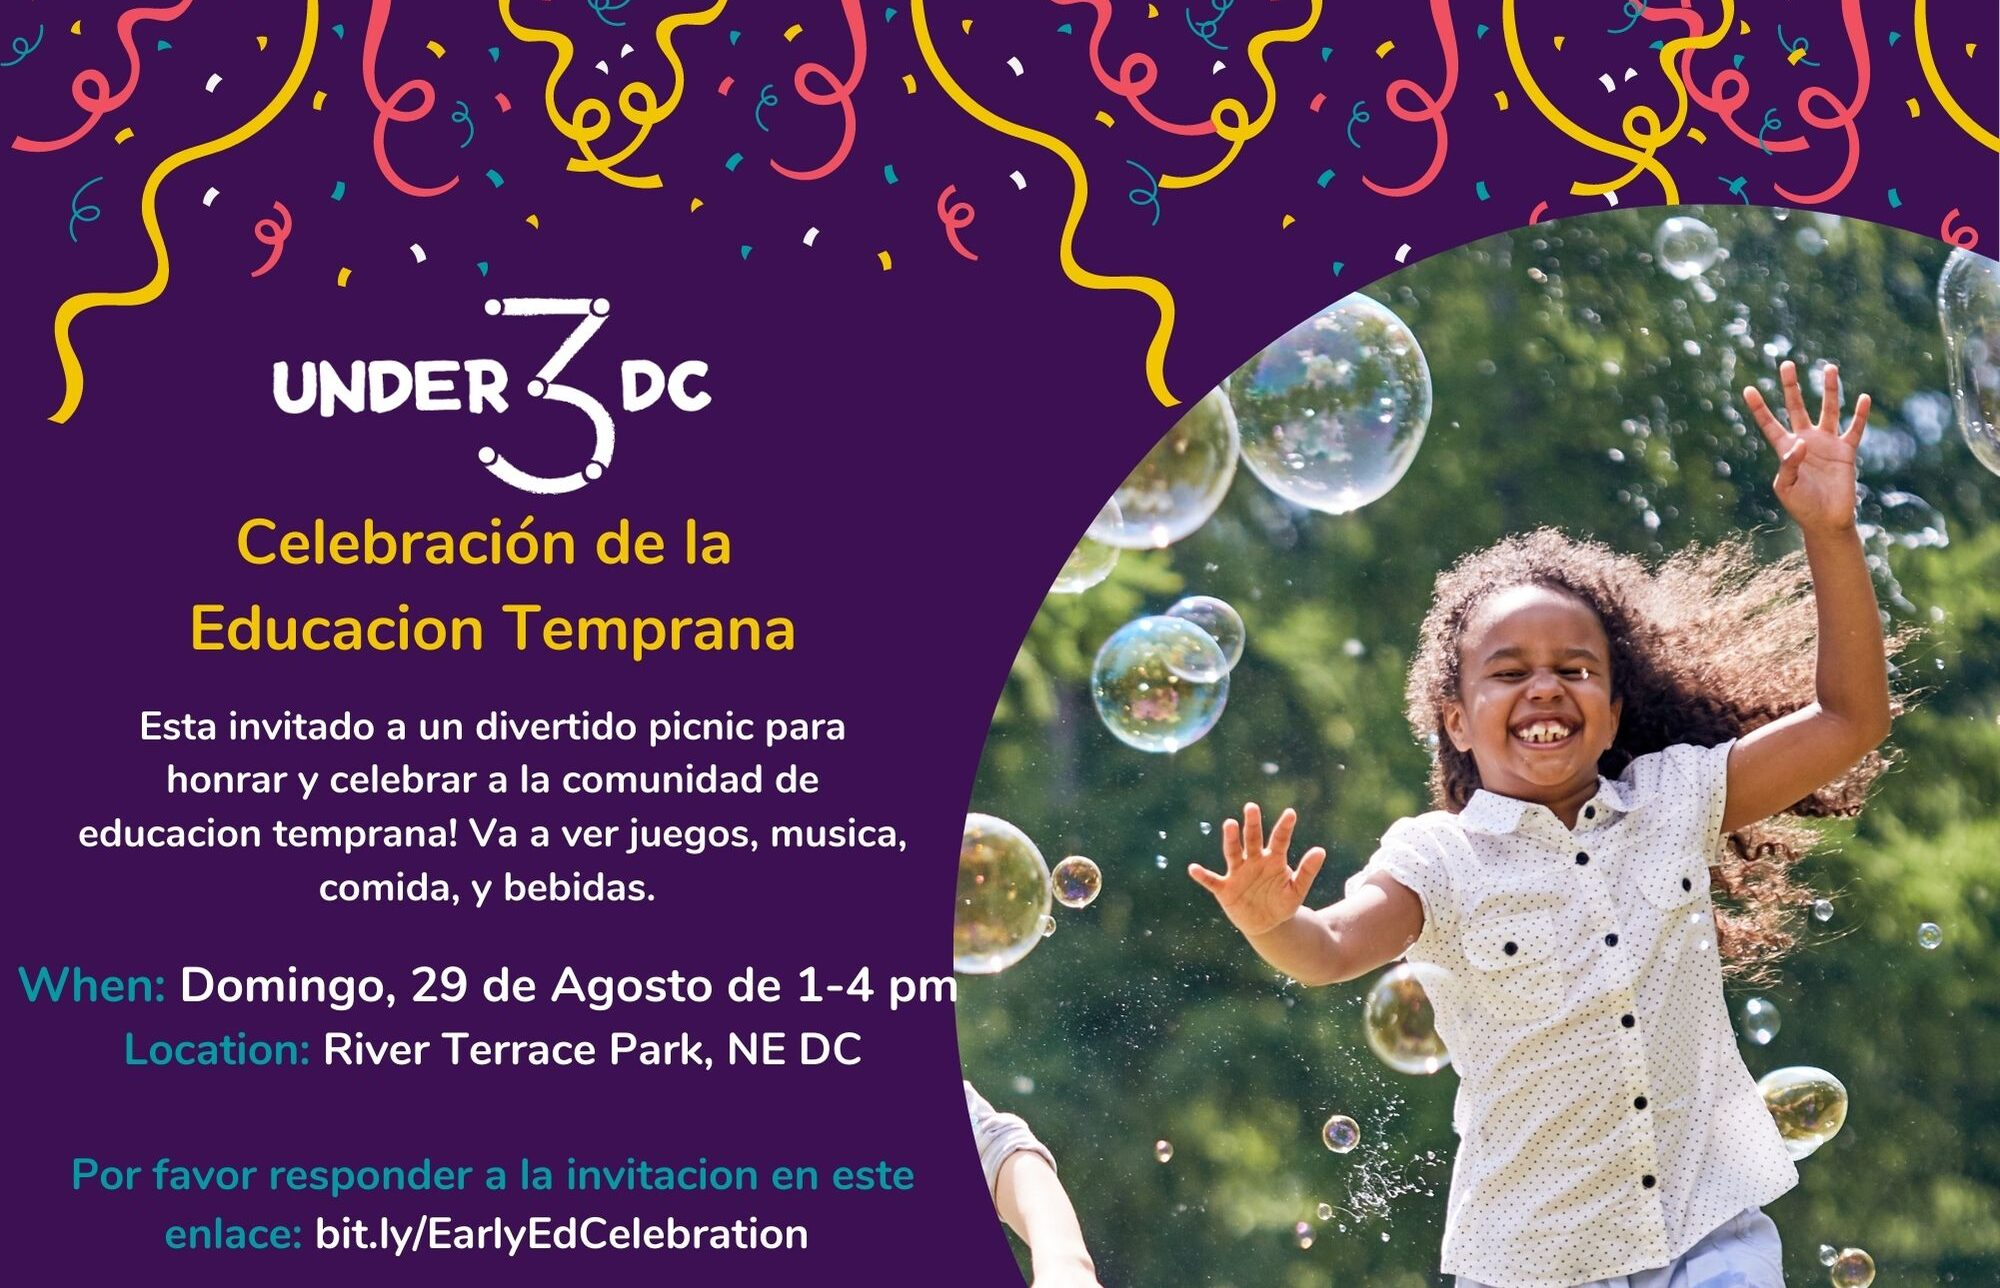 https://under3dc.org/wp-content/uploads/2021/08/spUnder-3-DC-Early-Education-Celebration-Picnic__Spanish-e1630207891494.jpeg